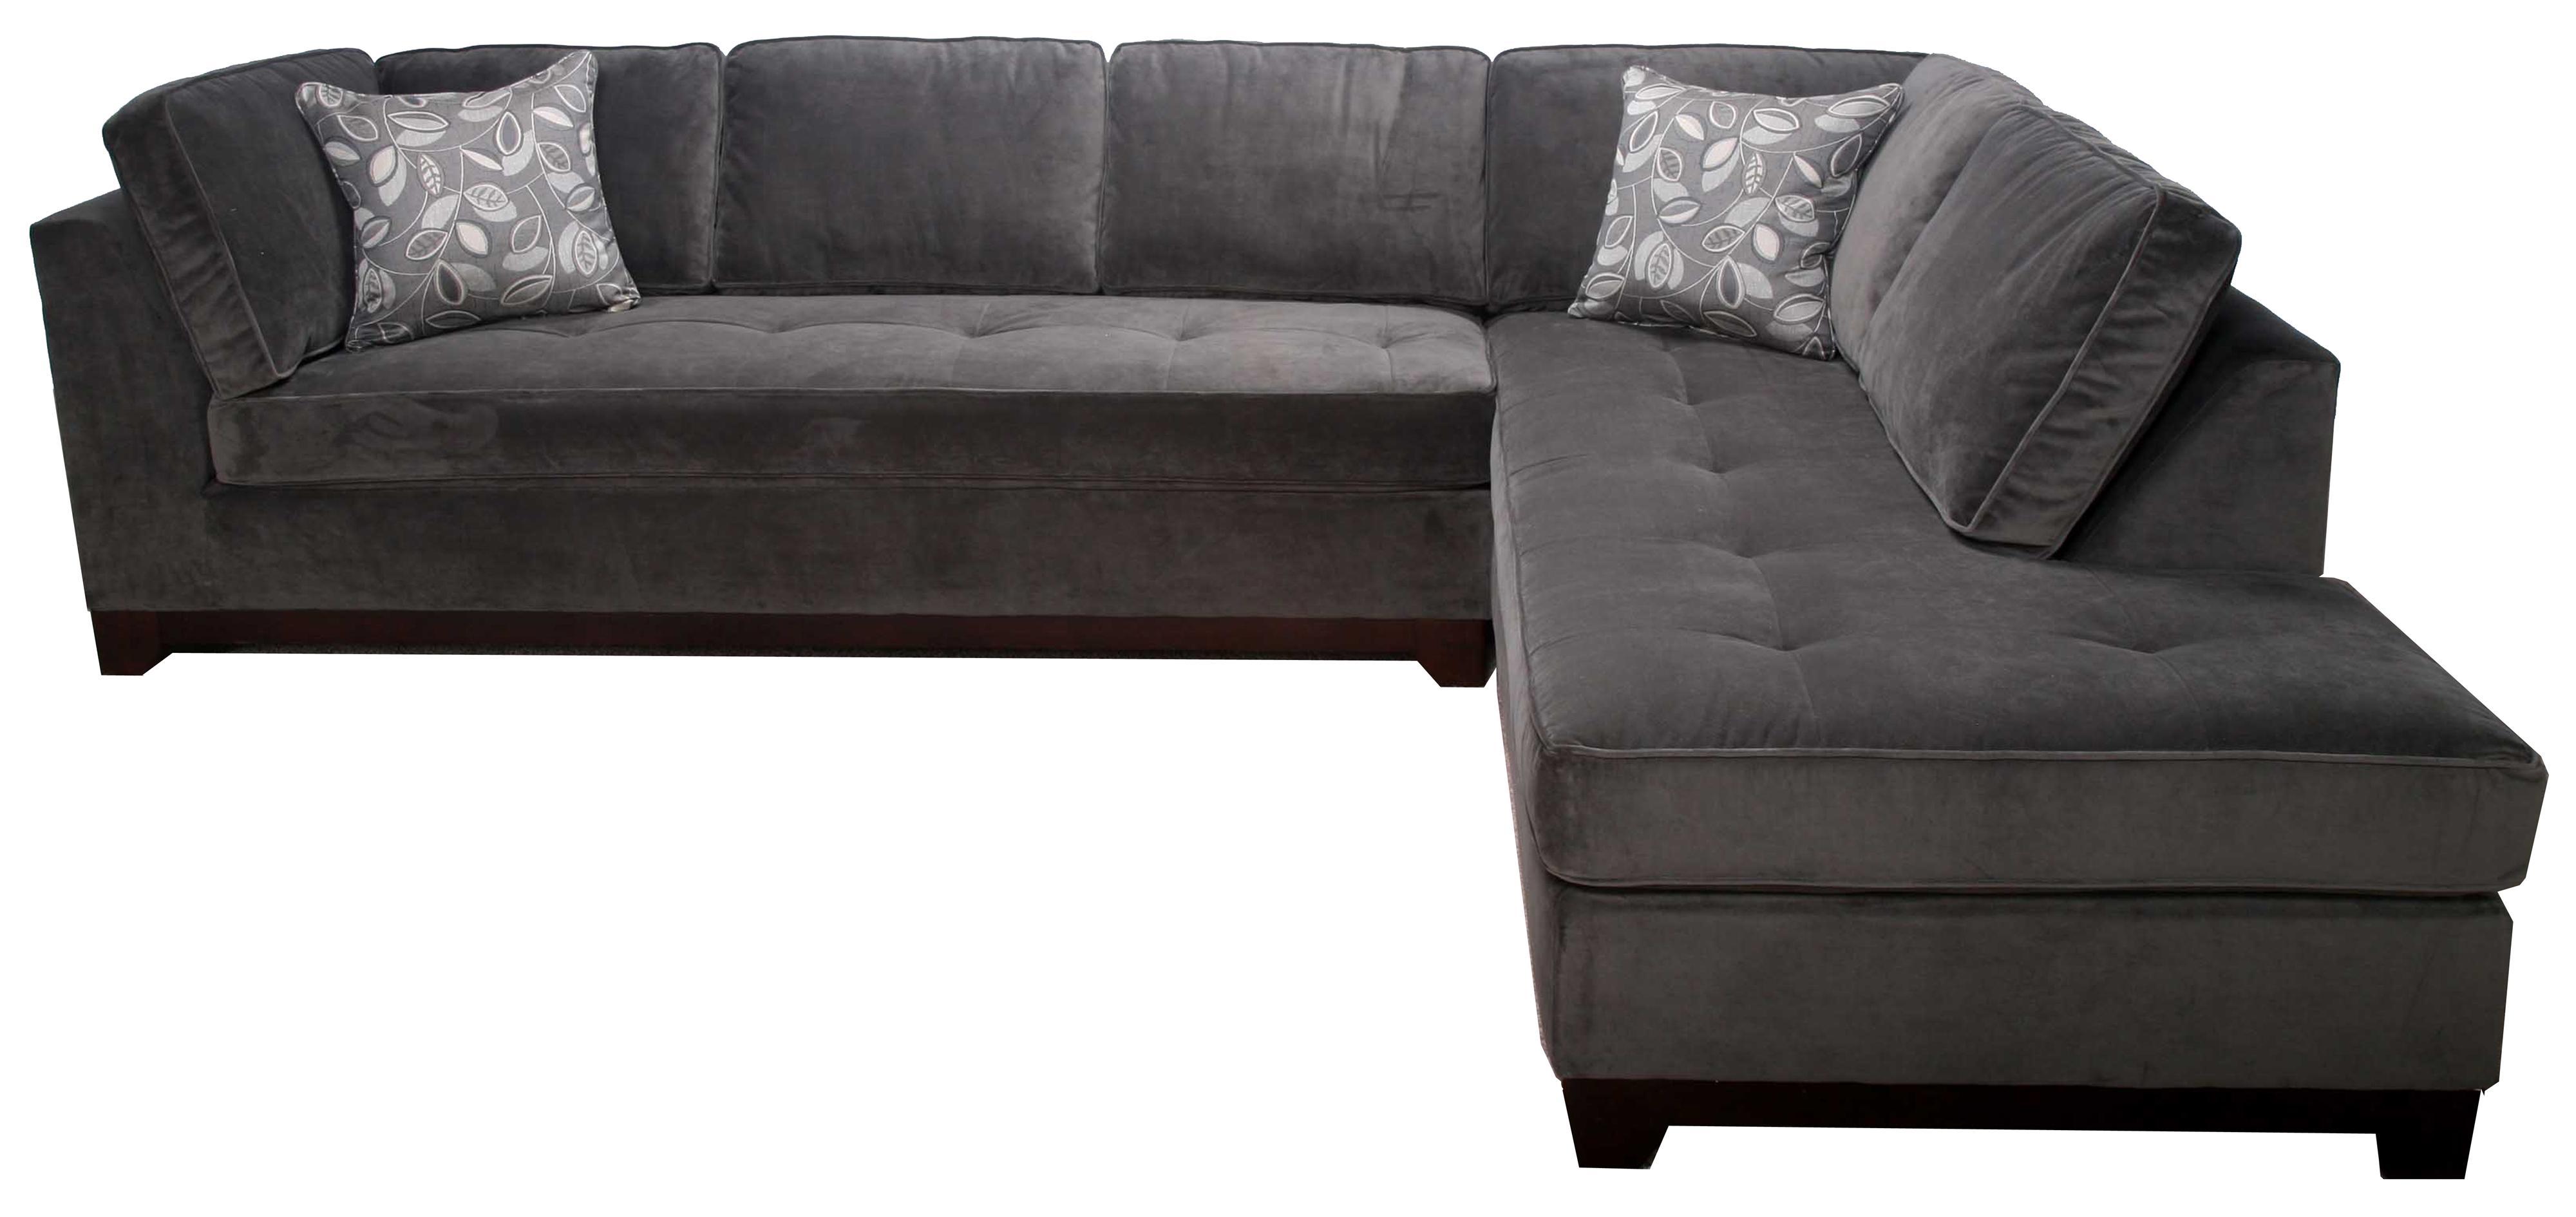 bauhaus sectional sofa bauhaus u09a stationary sectional. Black Bedroom Furniture Sets. Home Design Ideas